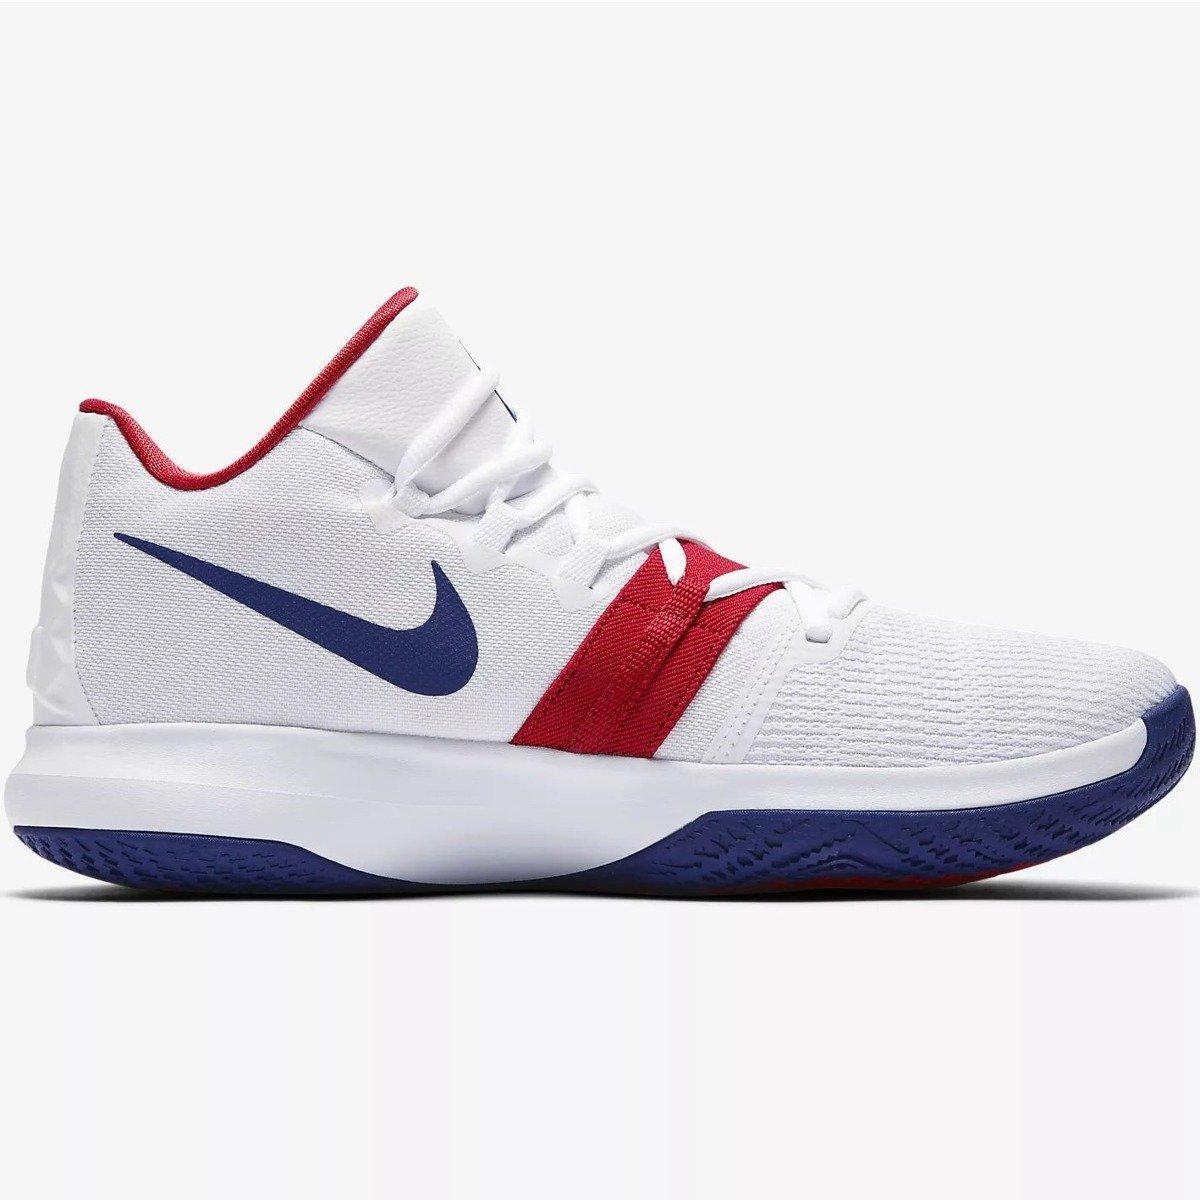 9baab789fce Nike Kyrie Flytrap Shoes - AA7071-146 146